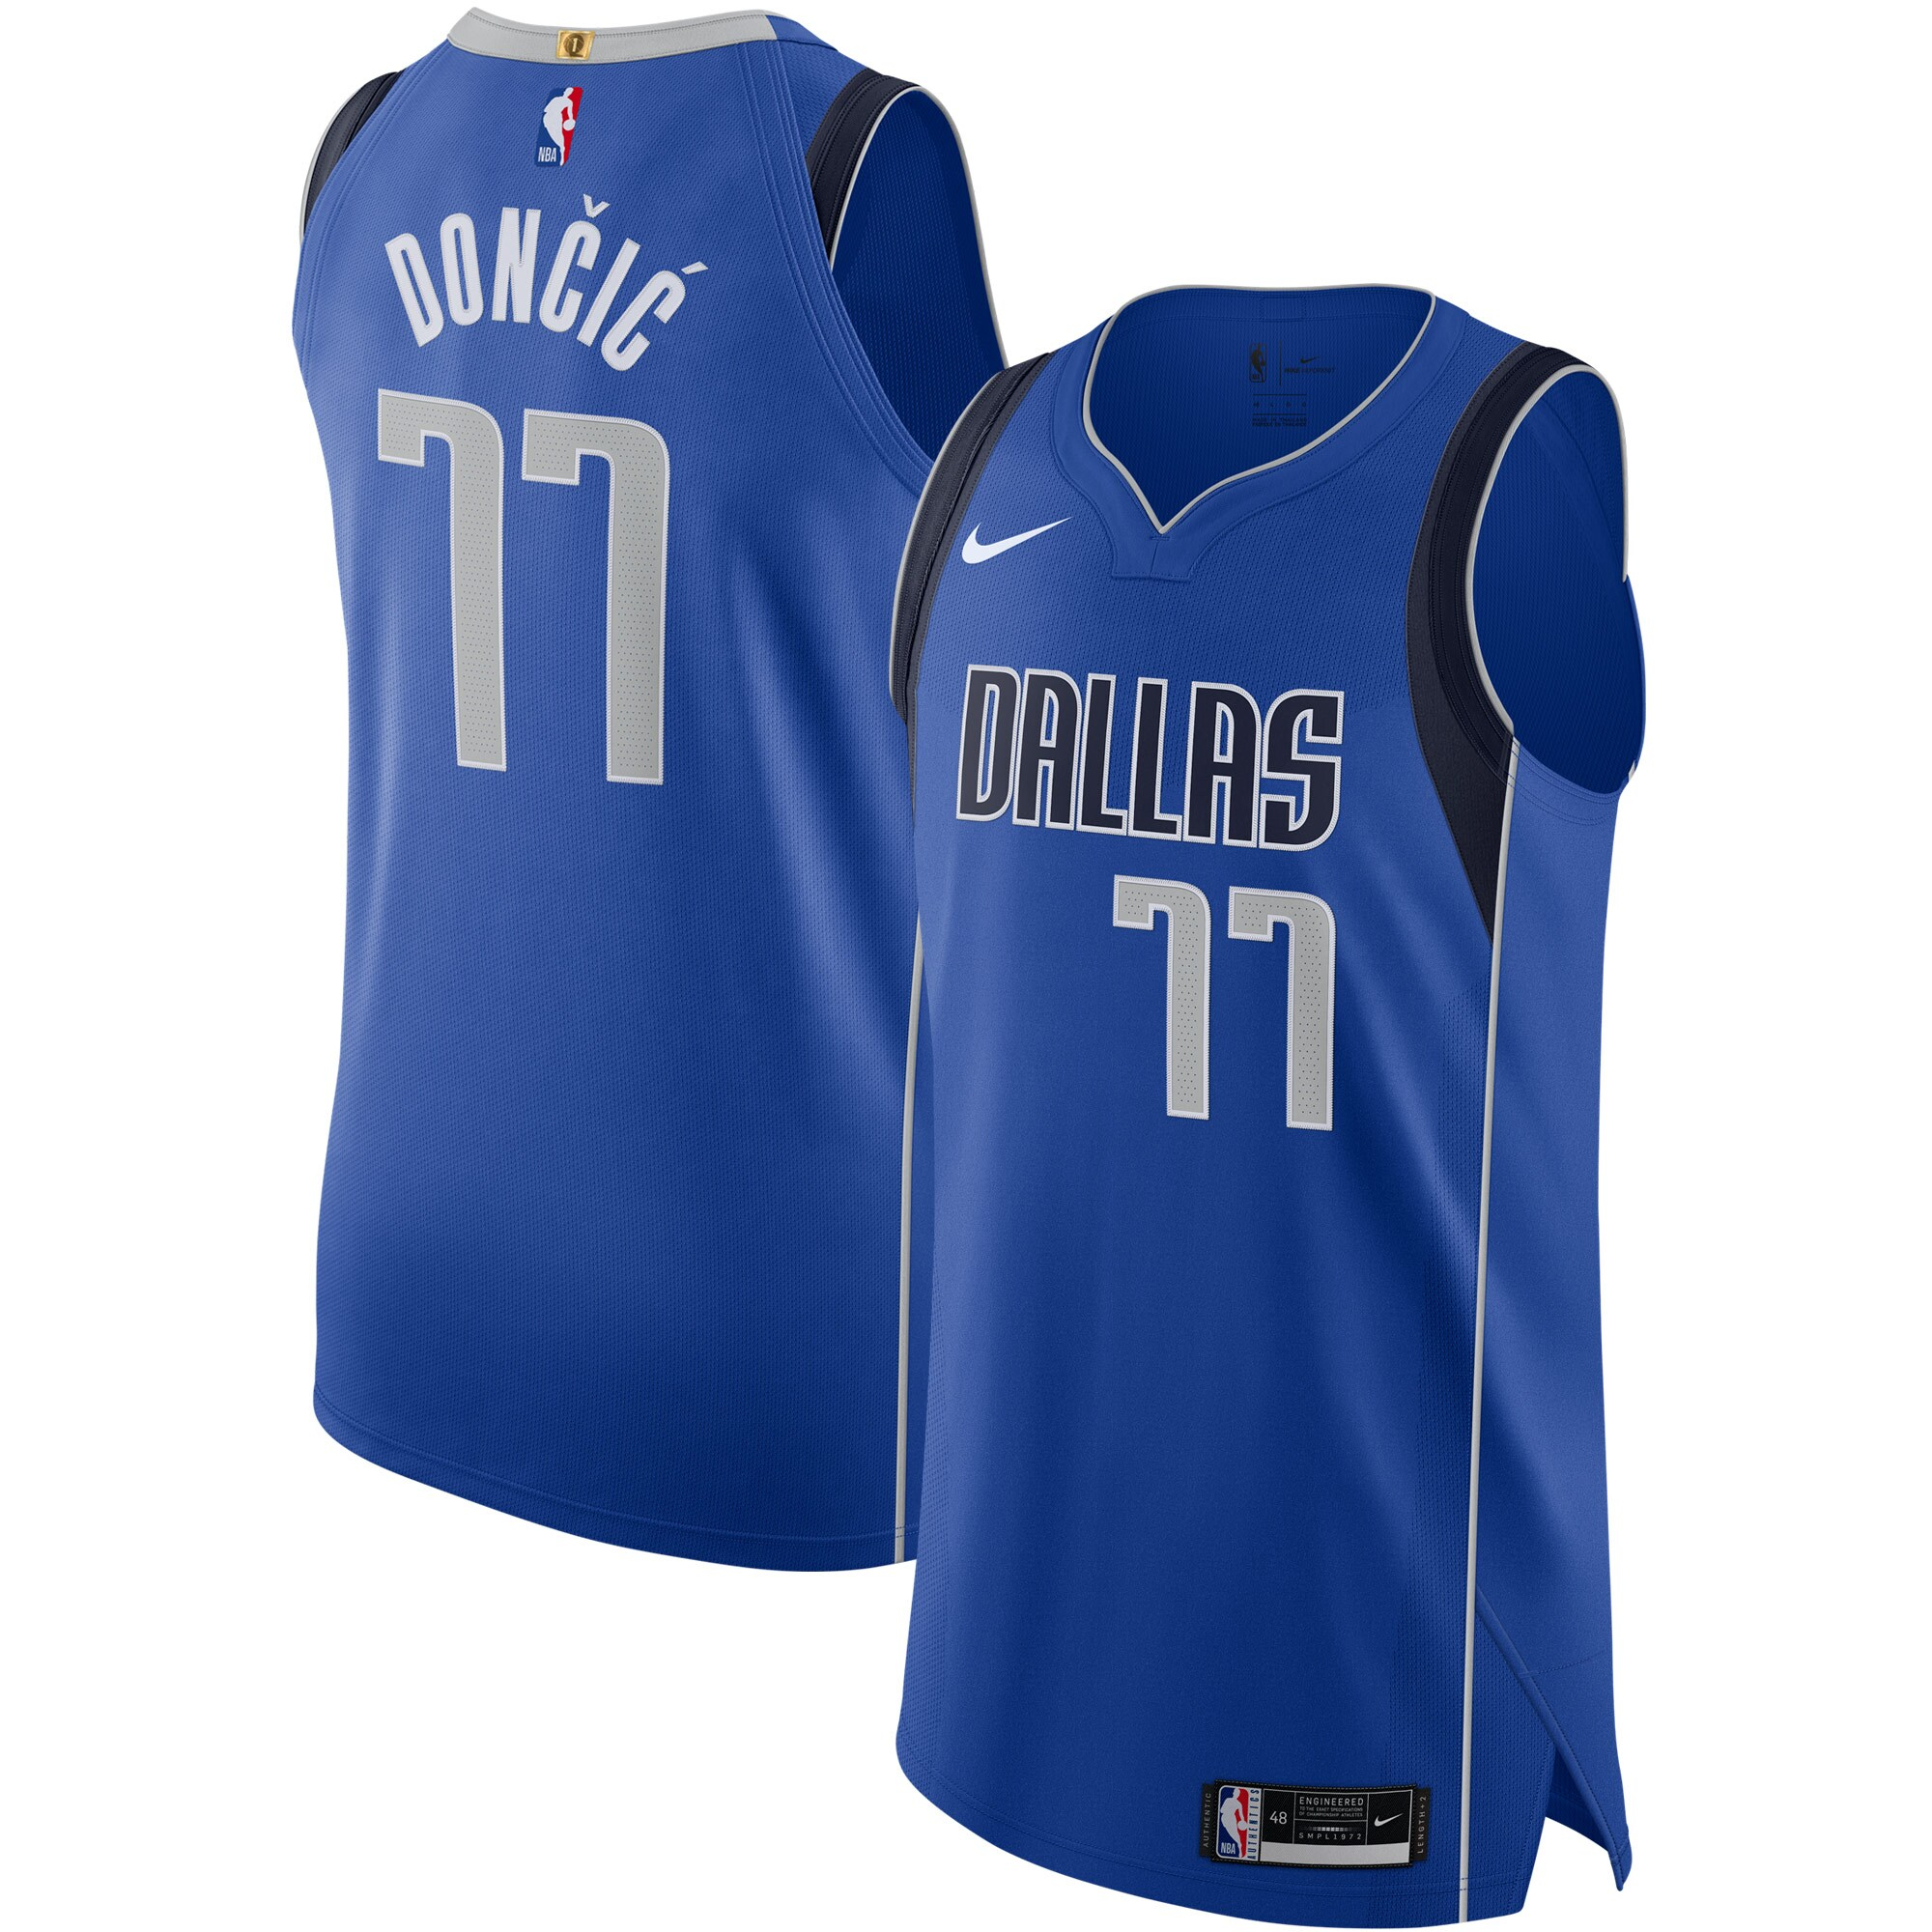 Luka Doncic Dallas Mavericks Nike 2020/21 Authentic Jersey - Icon Edition - Blue